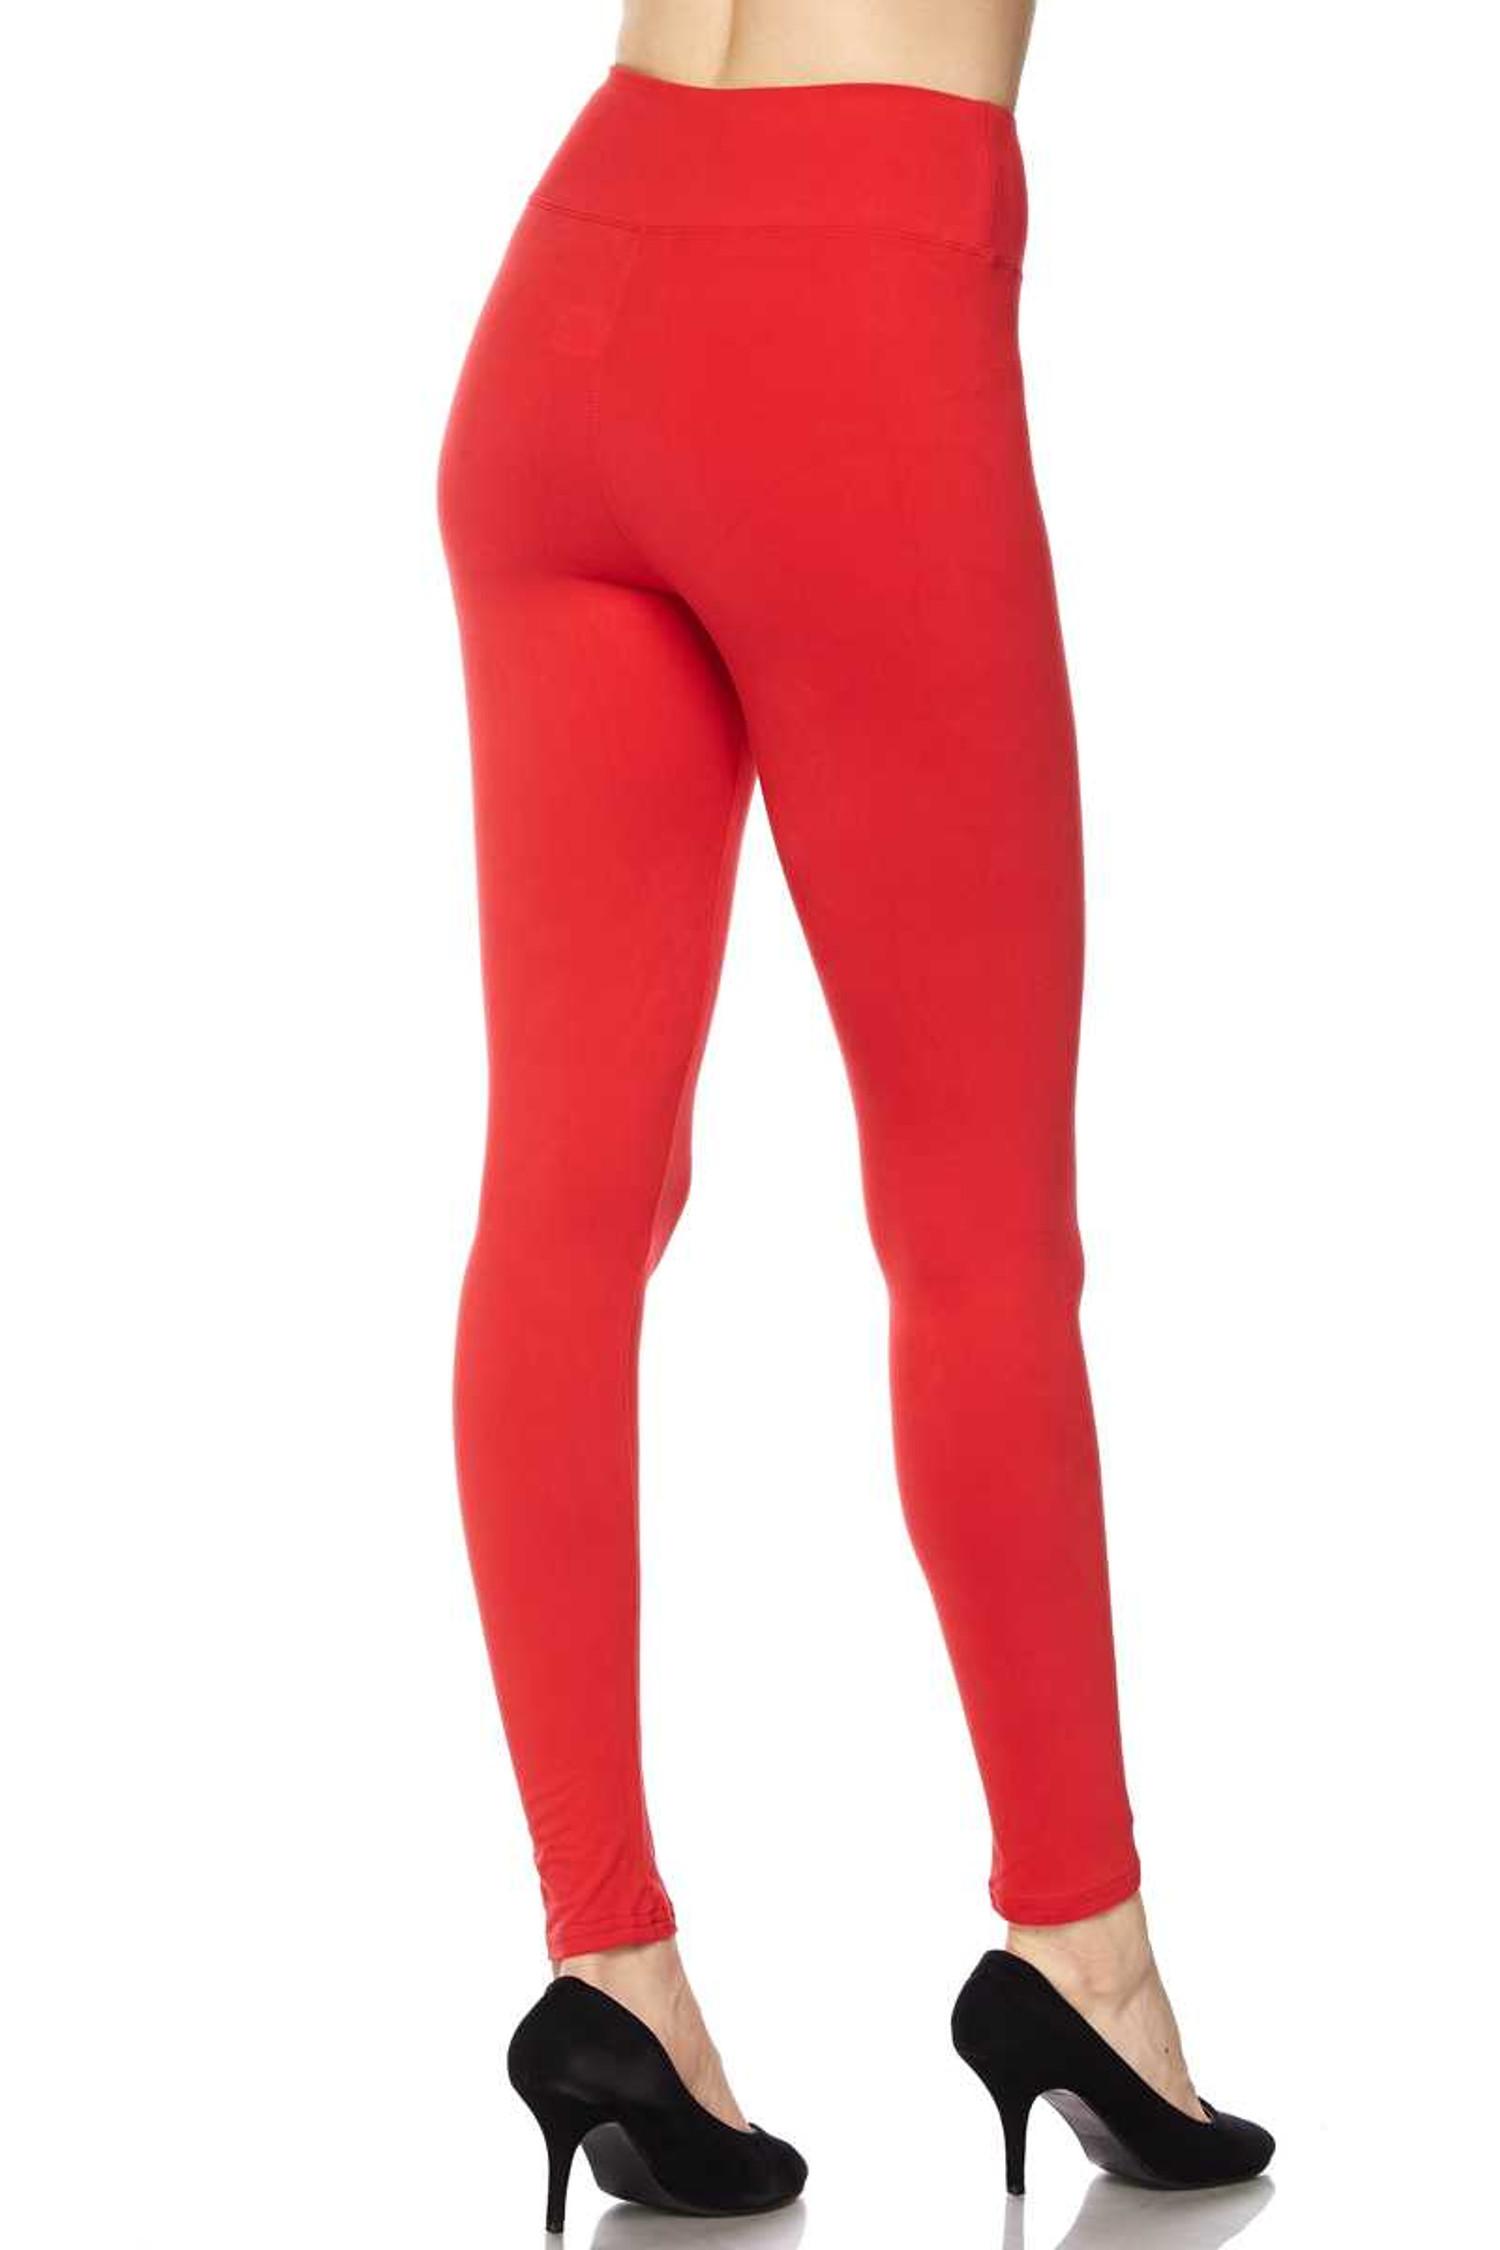 Brushed Basic Solid High Waisted Plus Size Leggings - 3X-5X